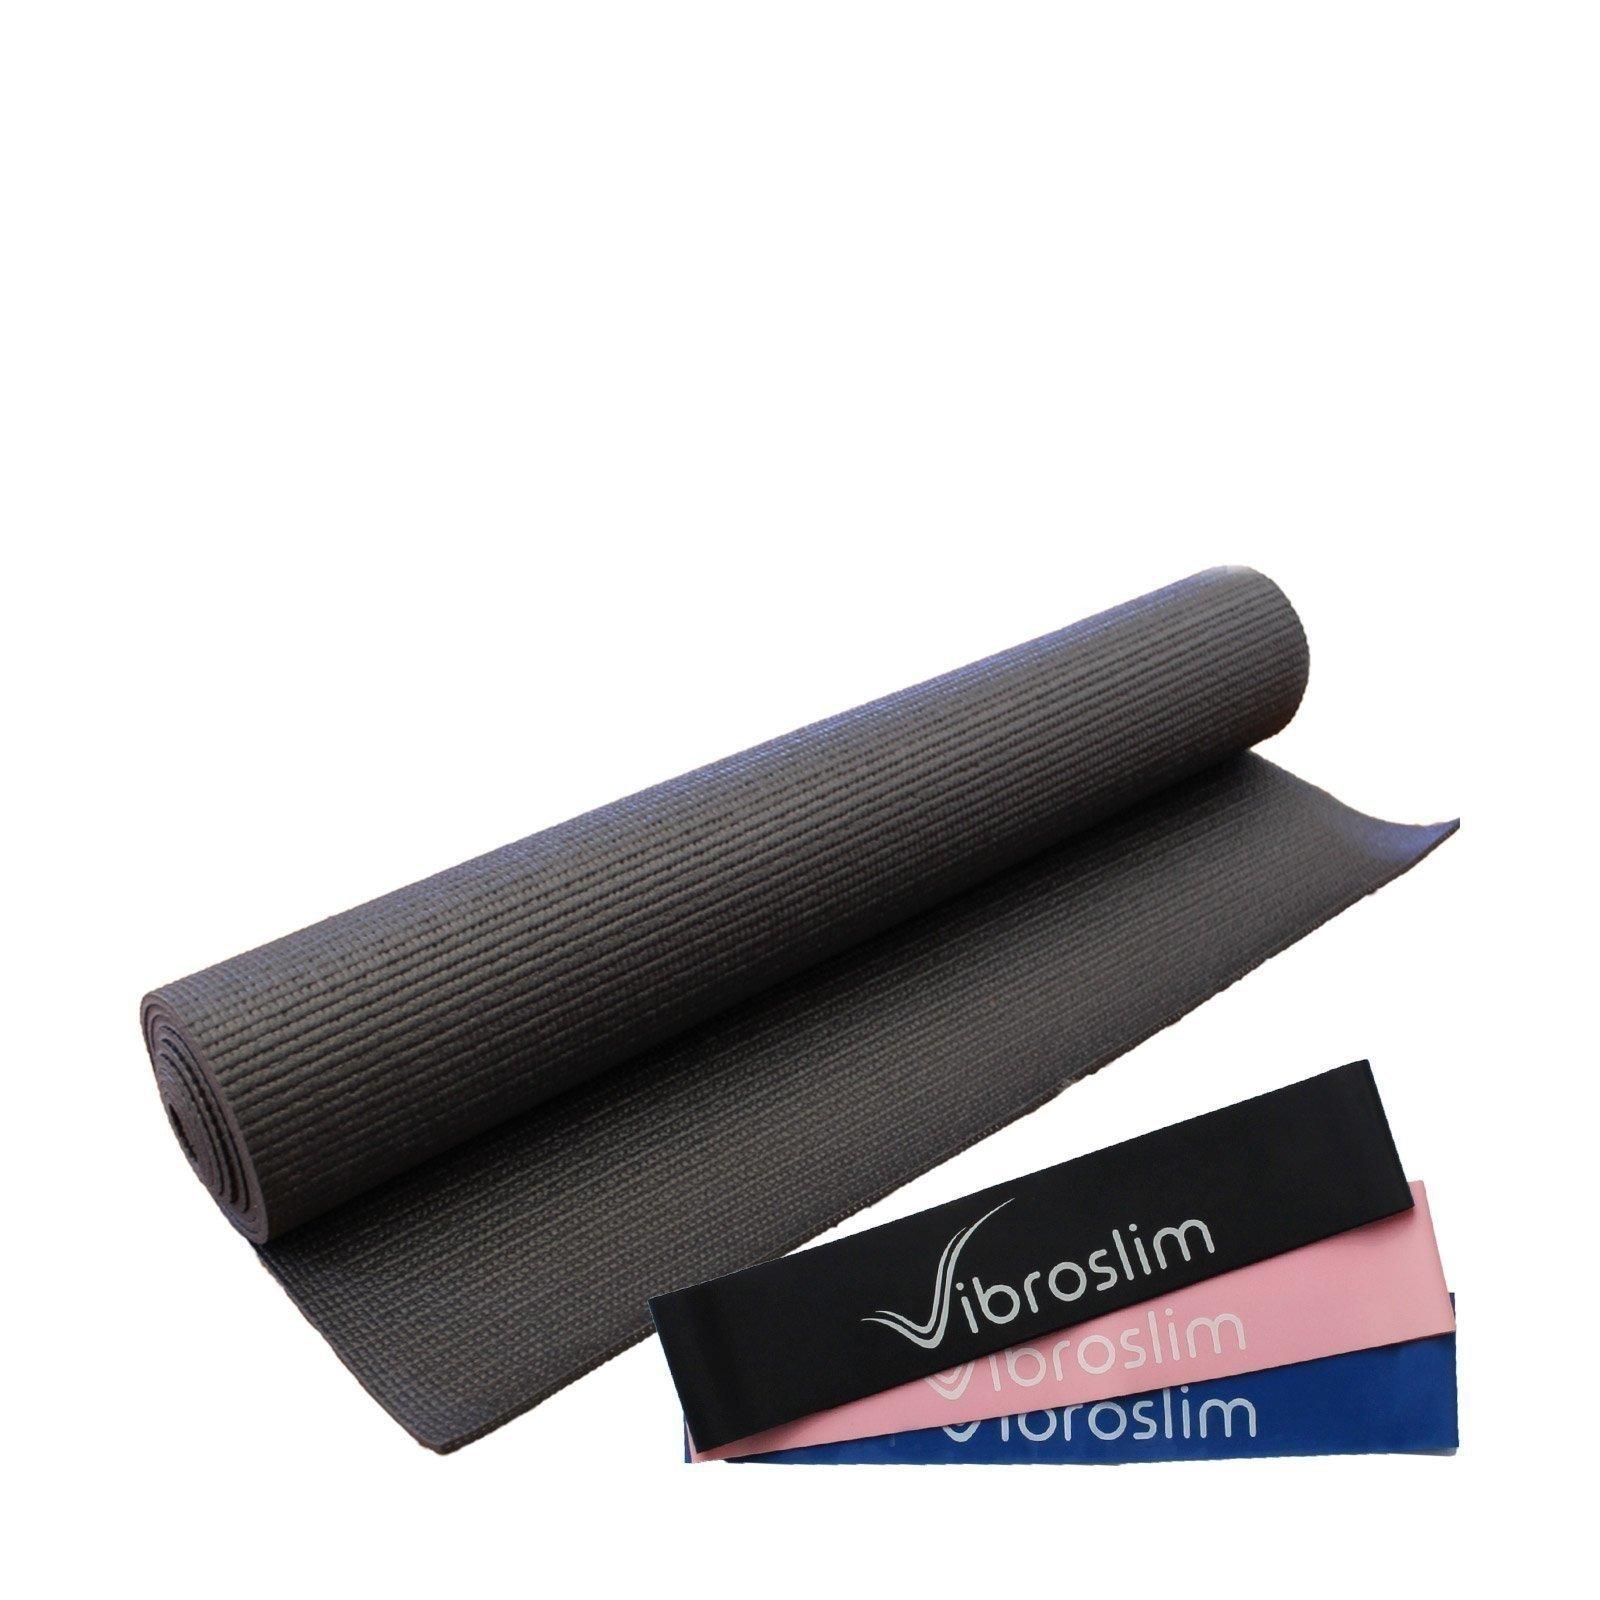 VibroSlim Exercise Mat & Resistance Band Set